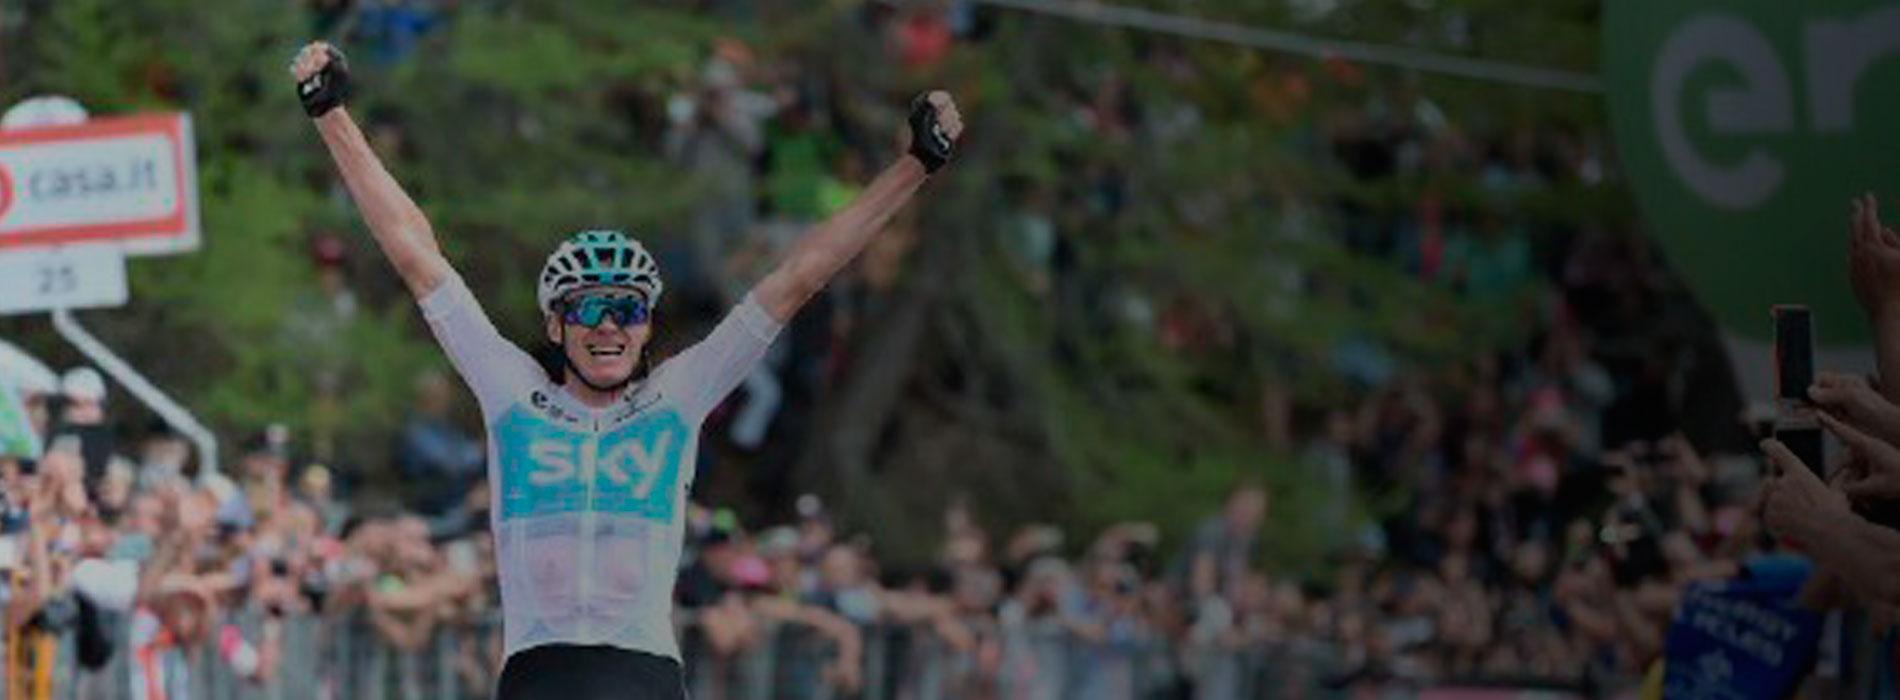 Chris Froome, nuevo líder del Giro de Italia / Giro Oficial